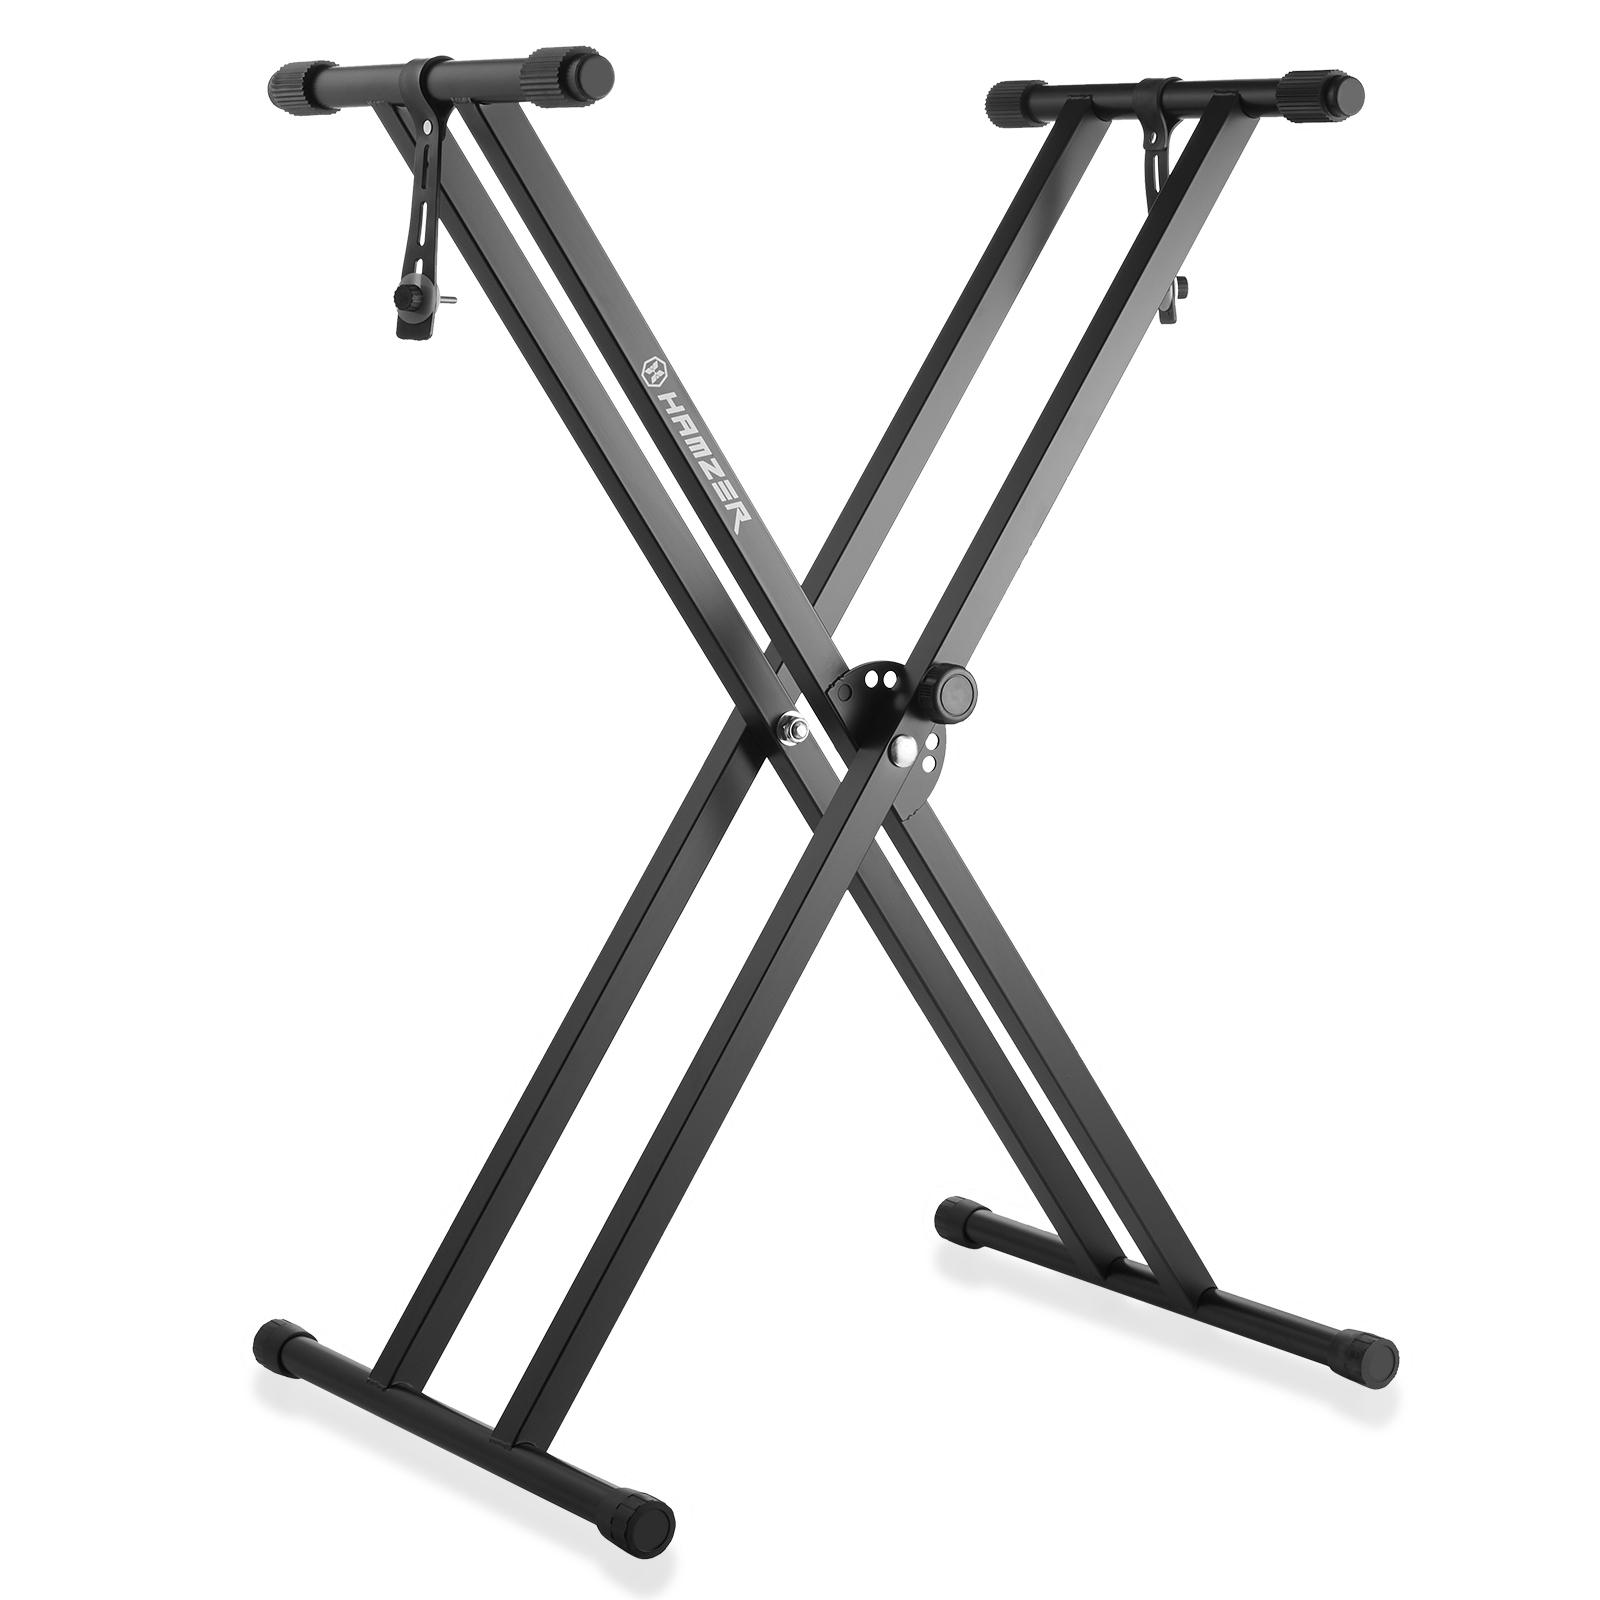 Hamzer Premium Heavy Duty Double Braced Adjustable X2